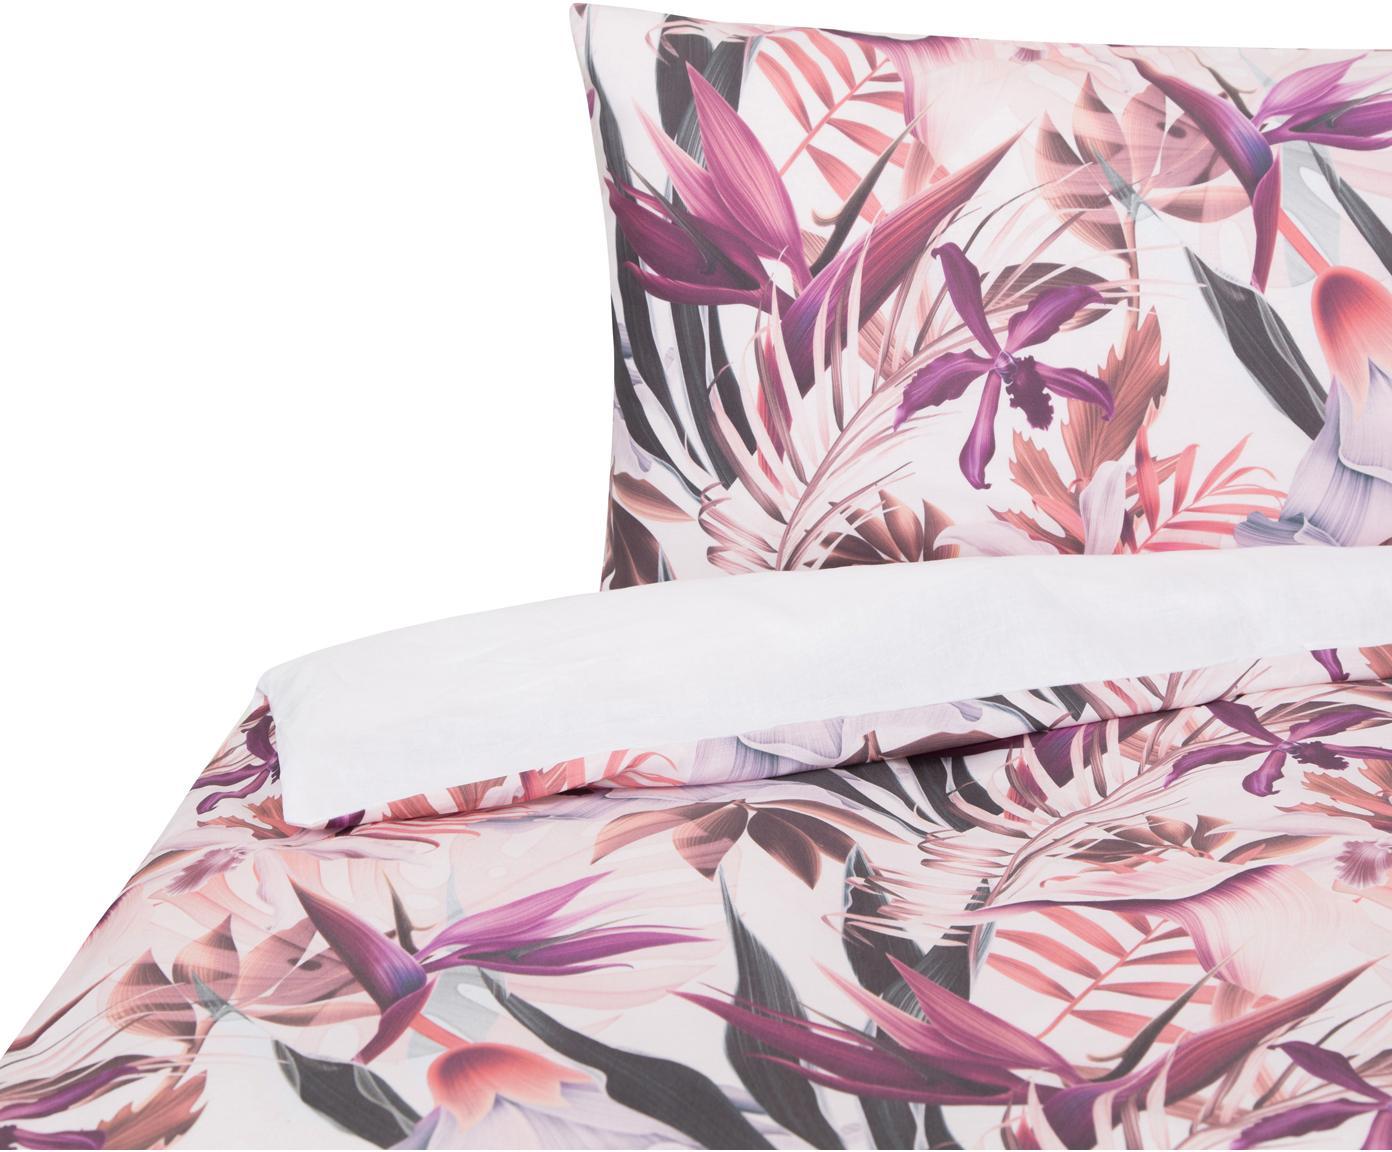 Funda nórdica doble cara Asia Pasion, Algodón, Tonos rosas y lilas, blanco, Cama 90 cm (160 x 220 cm)